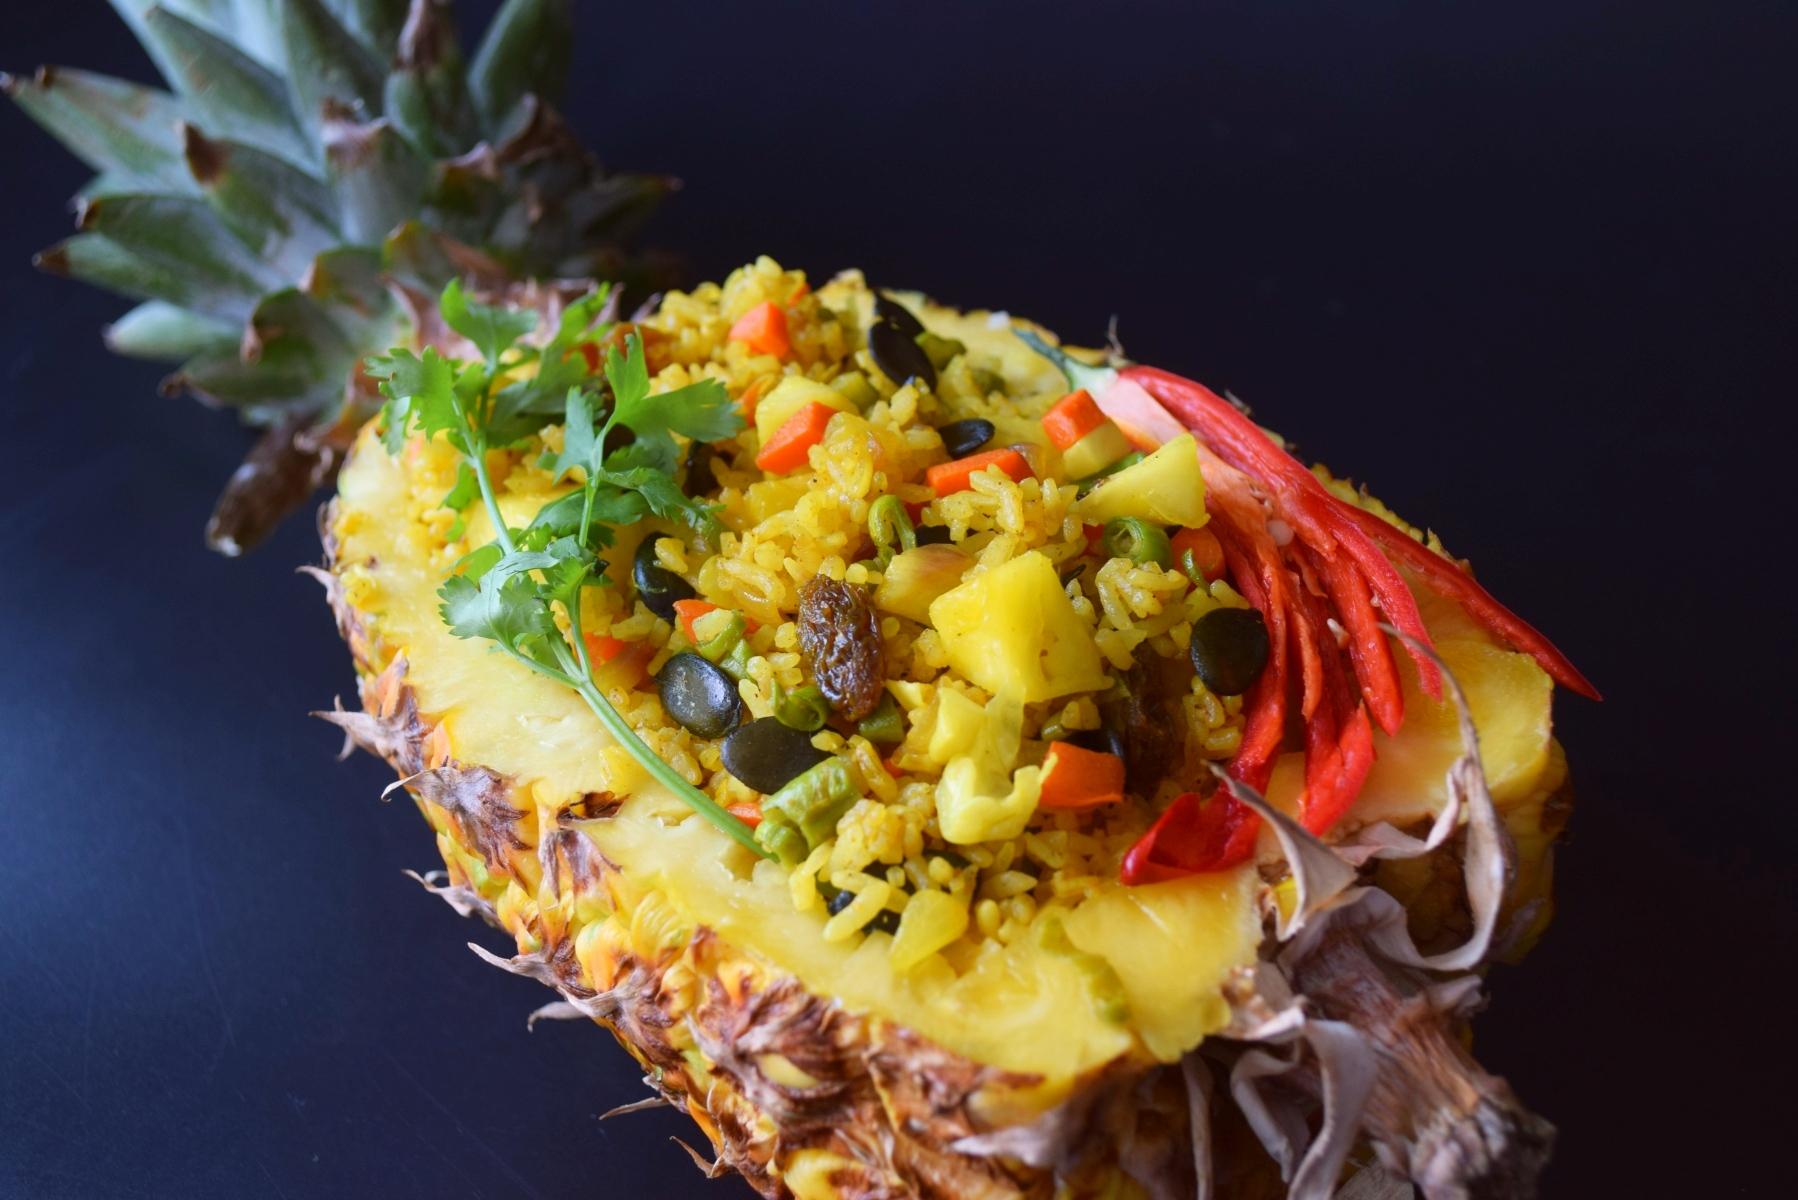 Pineapple Pumpkin Seed Fried Rice